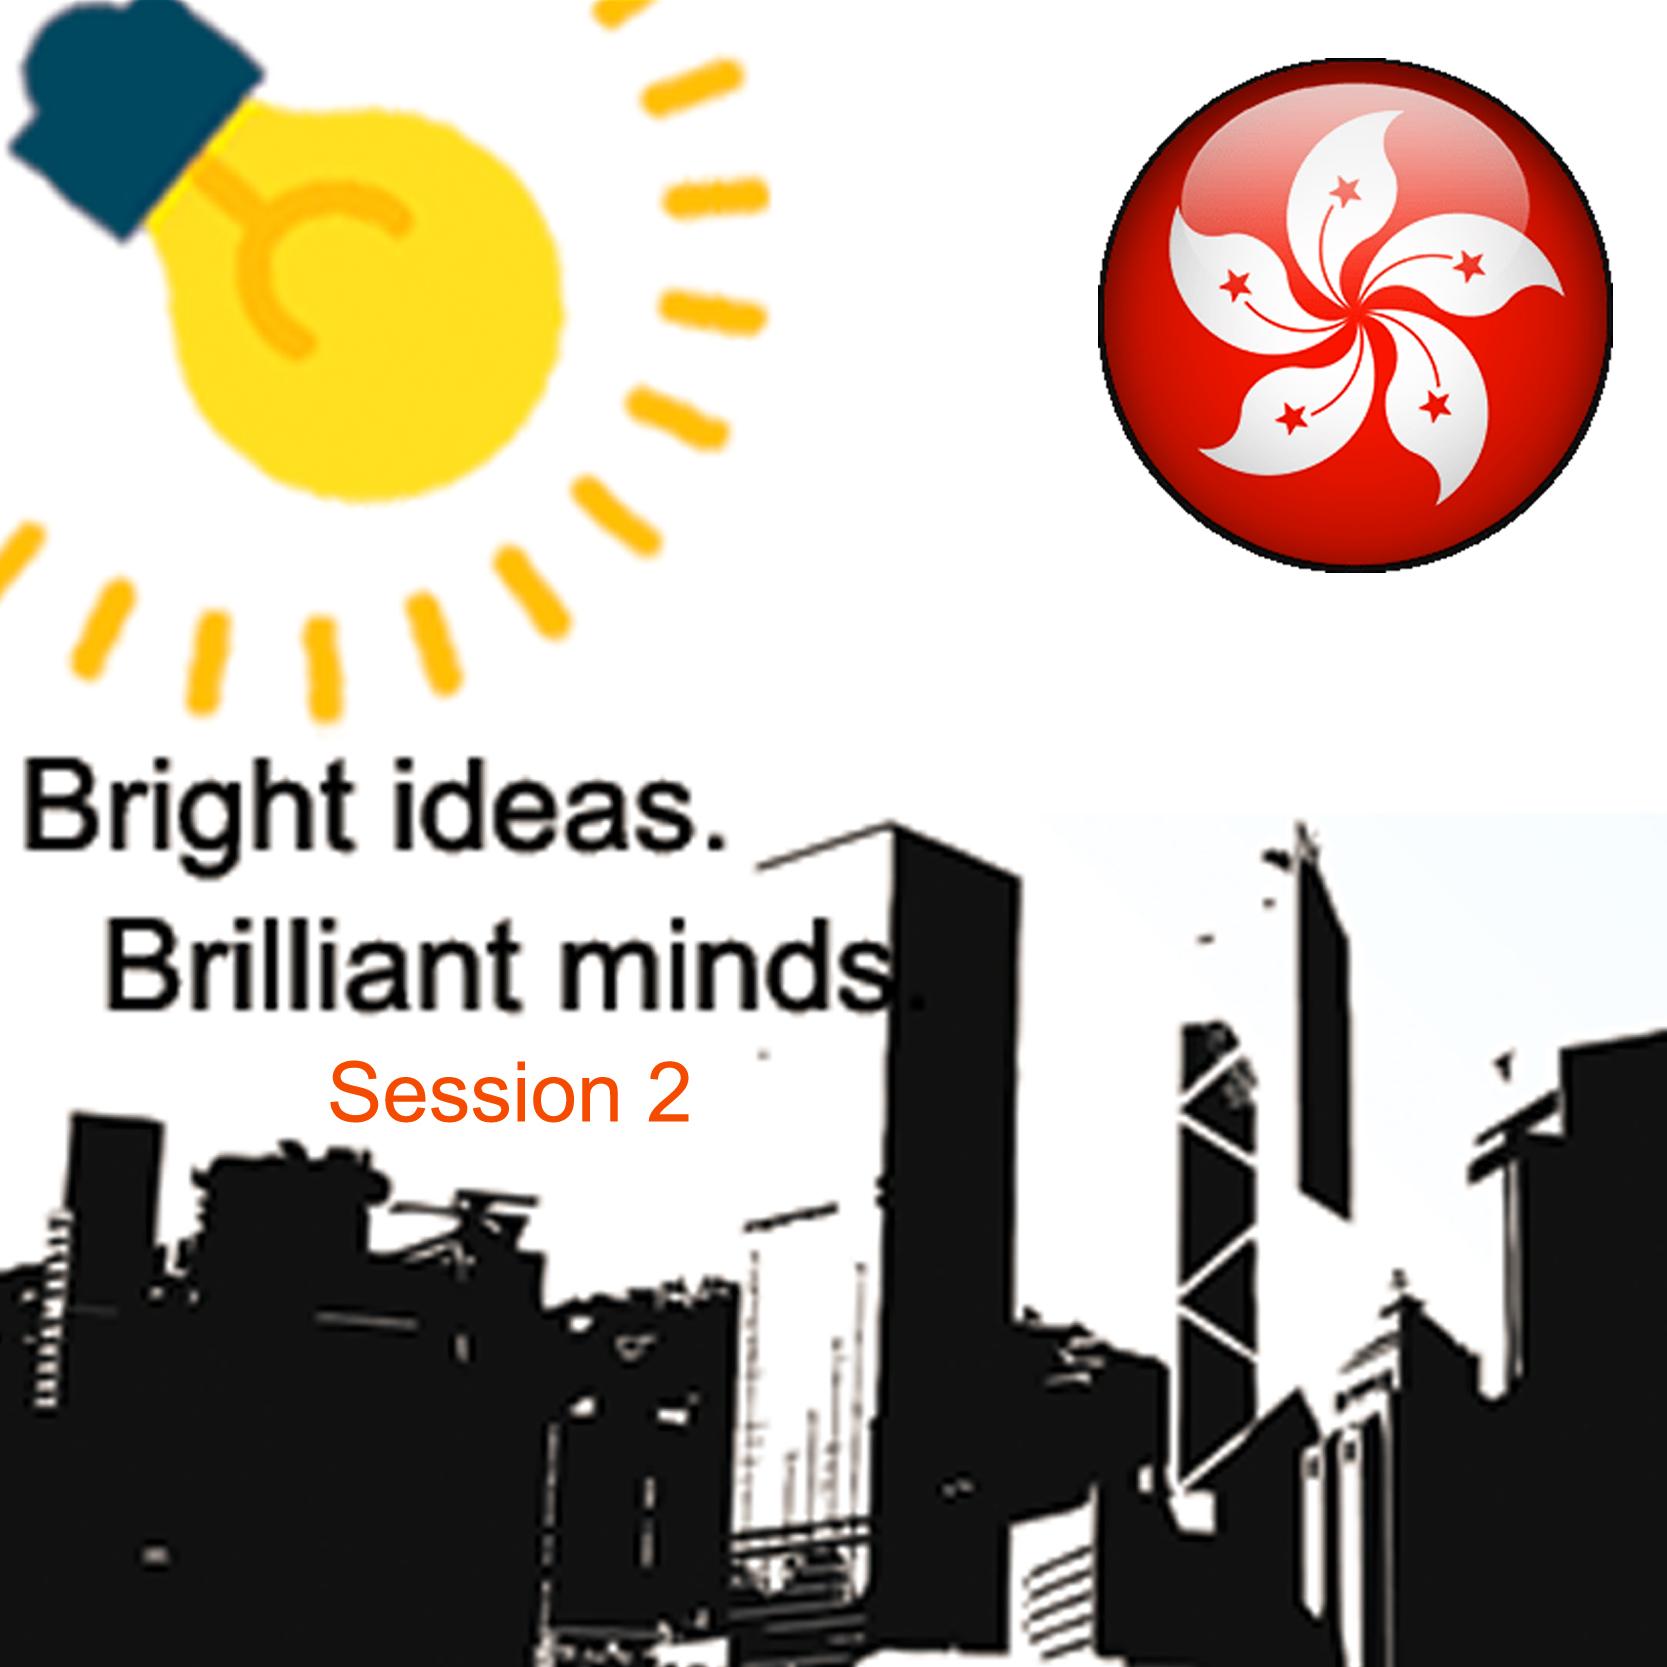 Nov 1 - Hong Kong Event: Bright ideas. Brilliant minds - Session 2